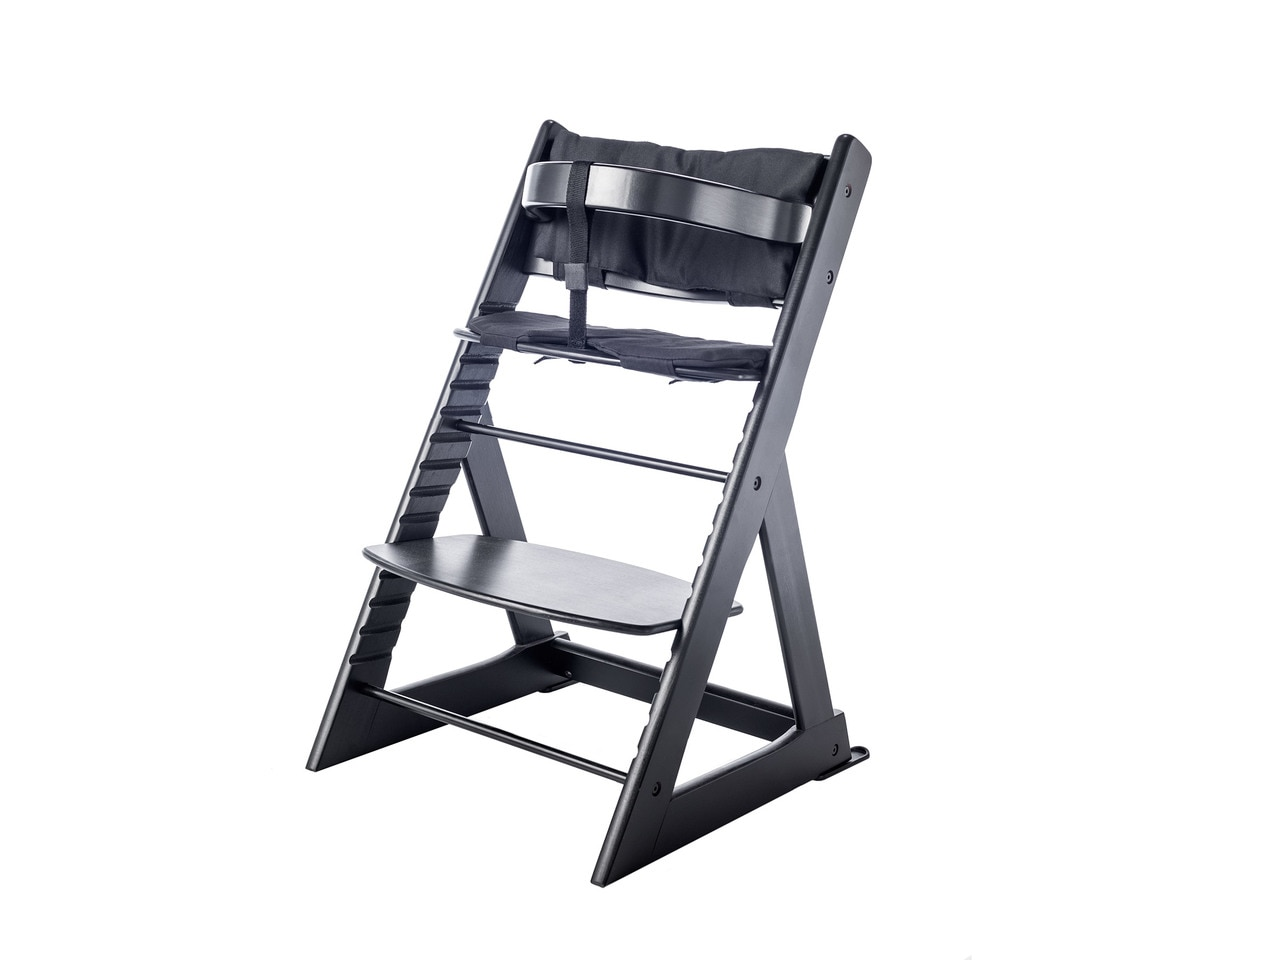 Soho Wooden Highchair - Black